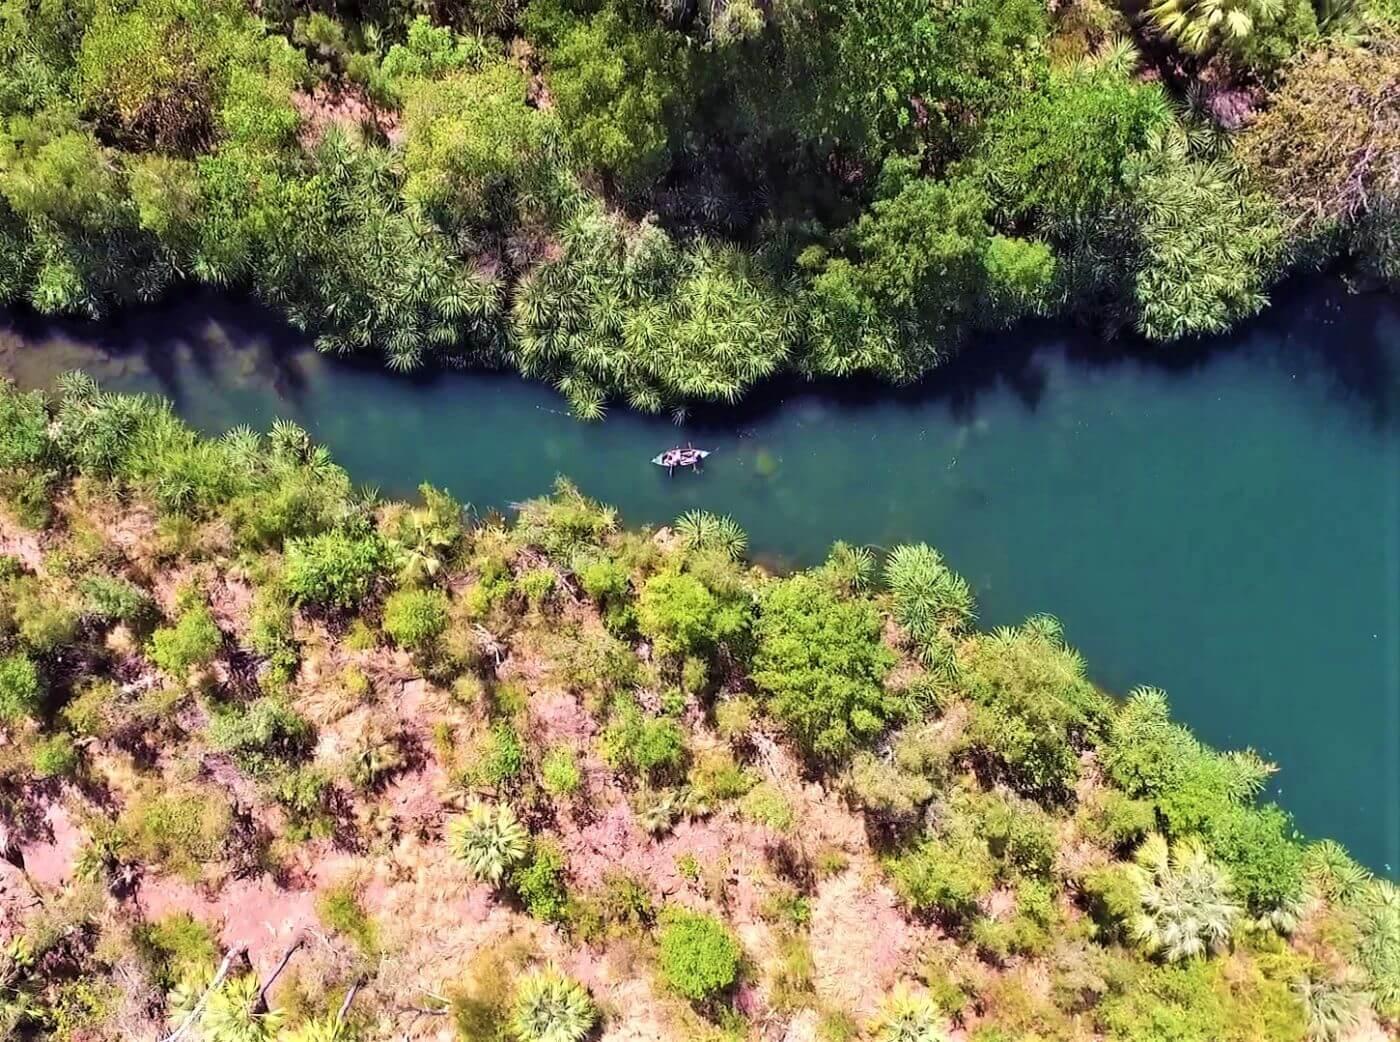 Kanu fahren im Bodjamulla National Park